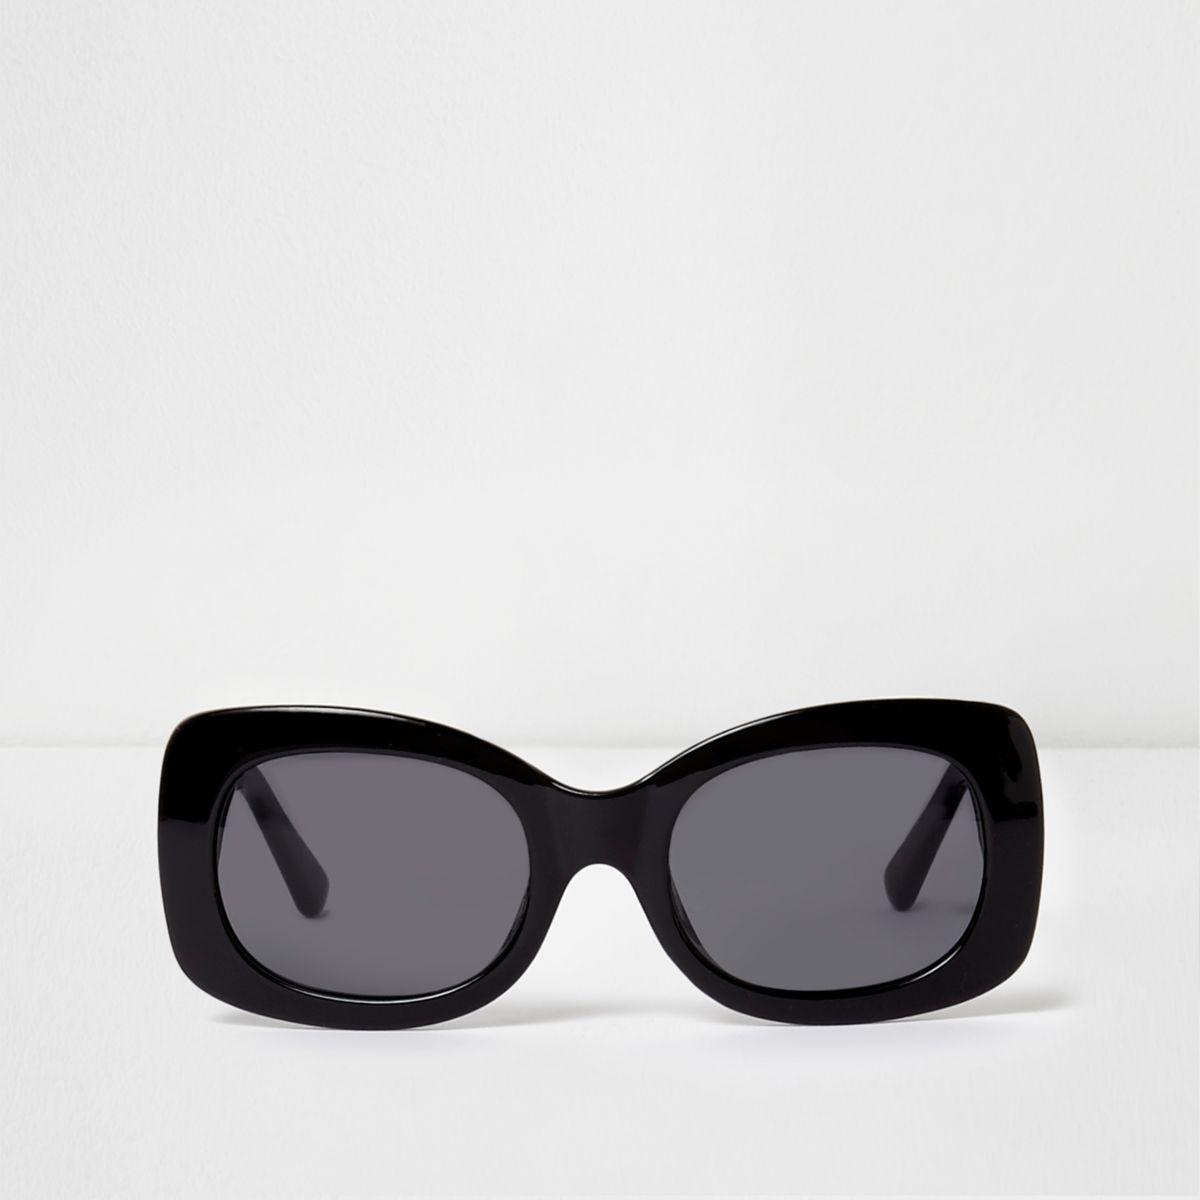 Black square frame glam sunglasses